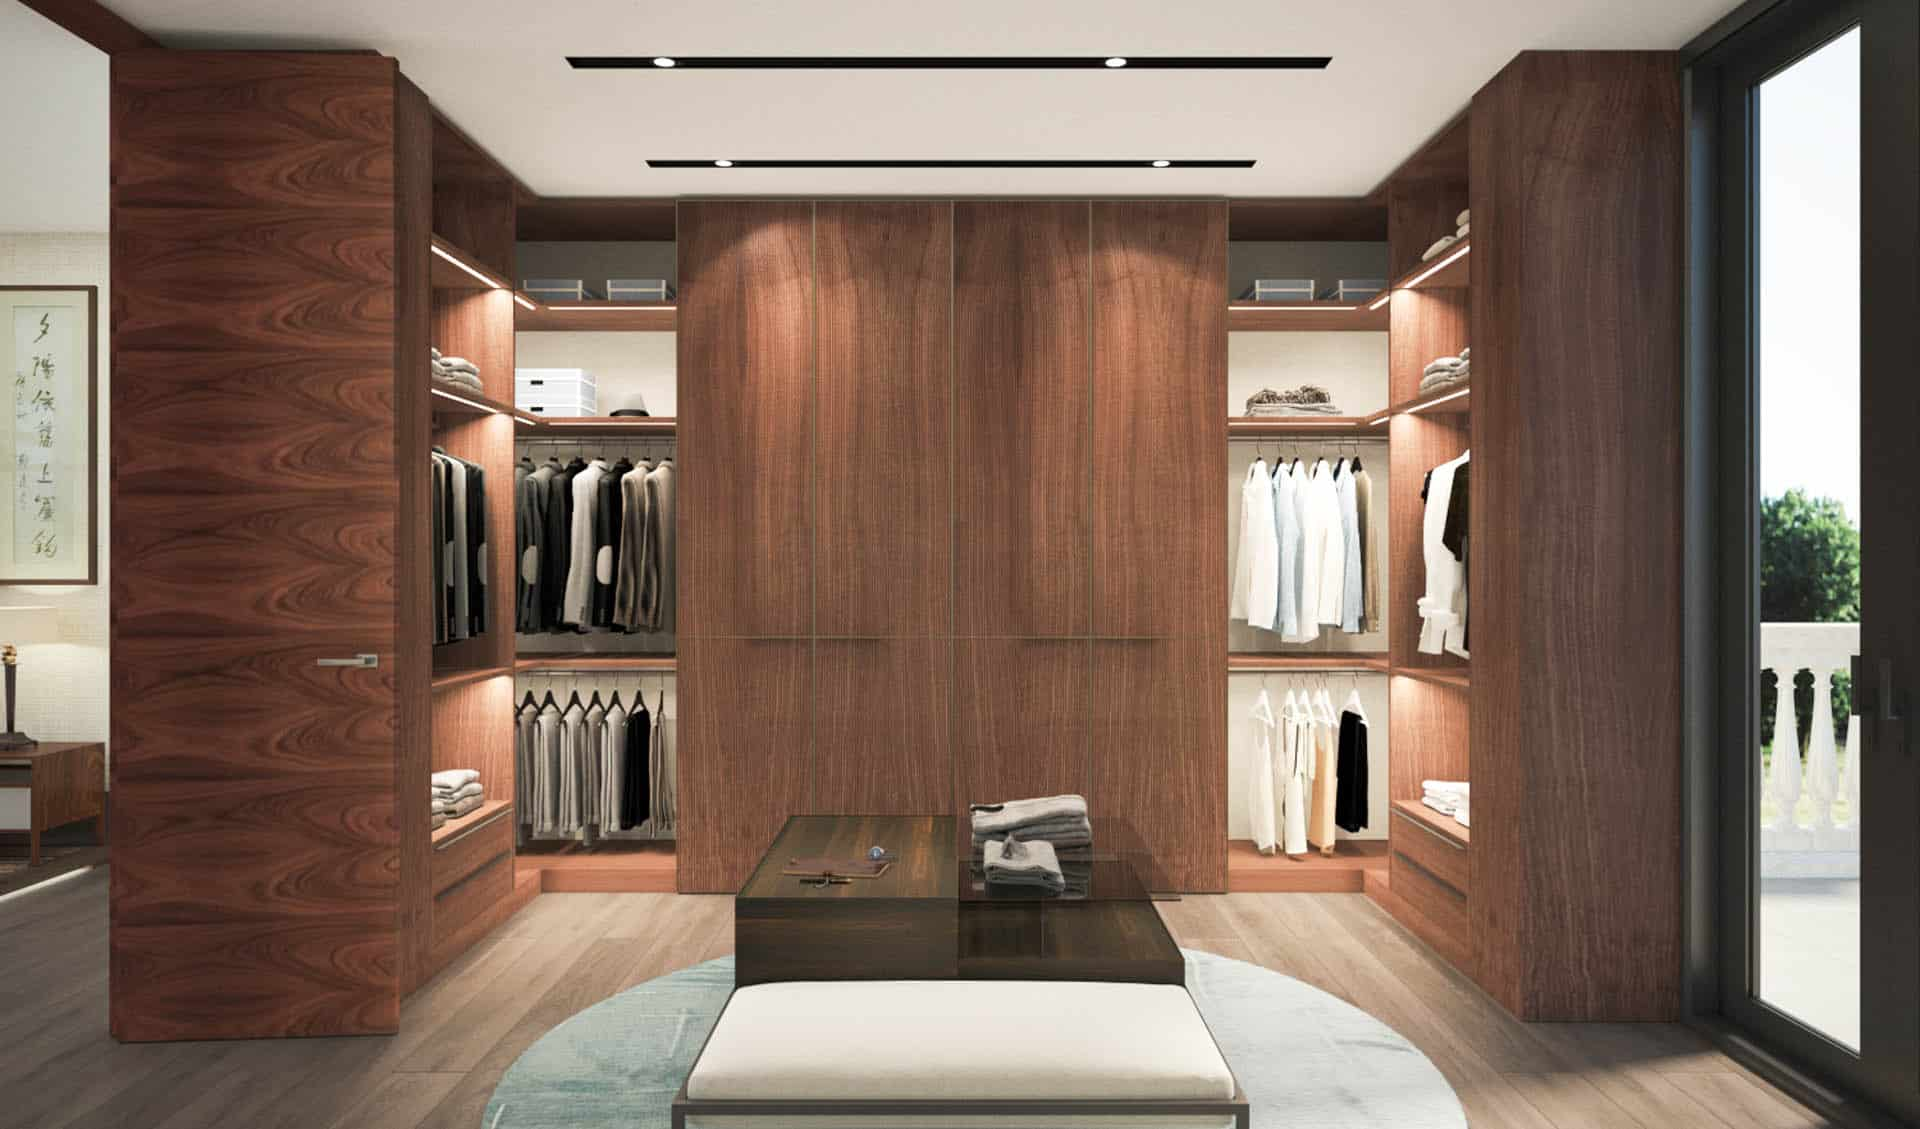 walk in closet. muebles de diseño